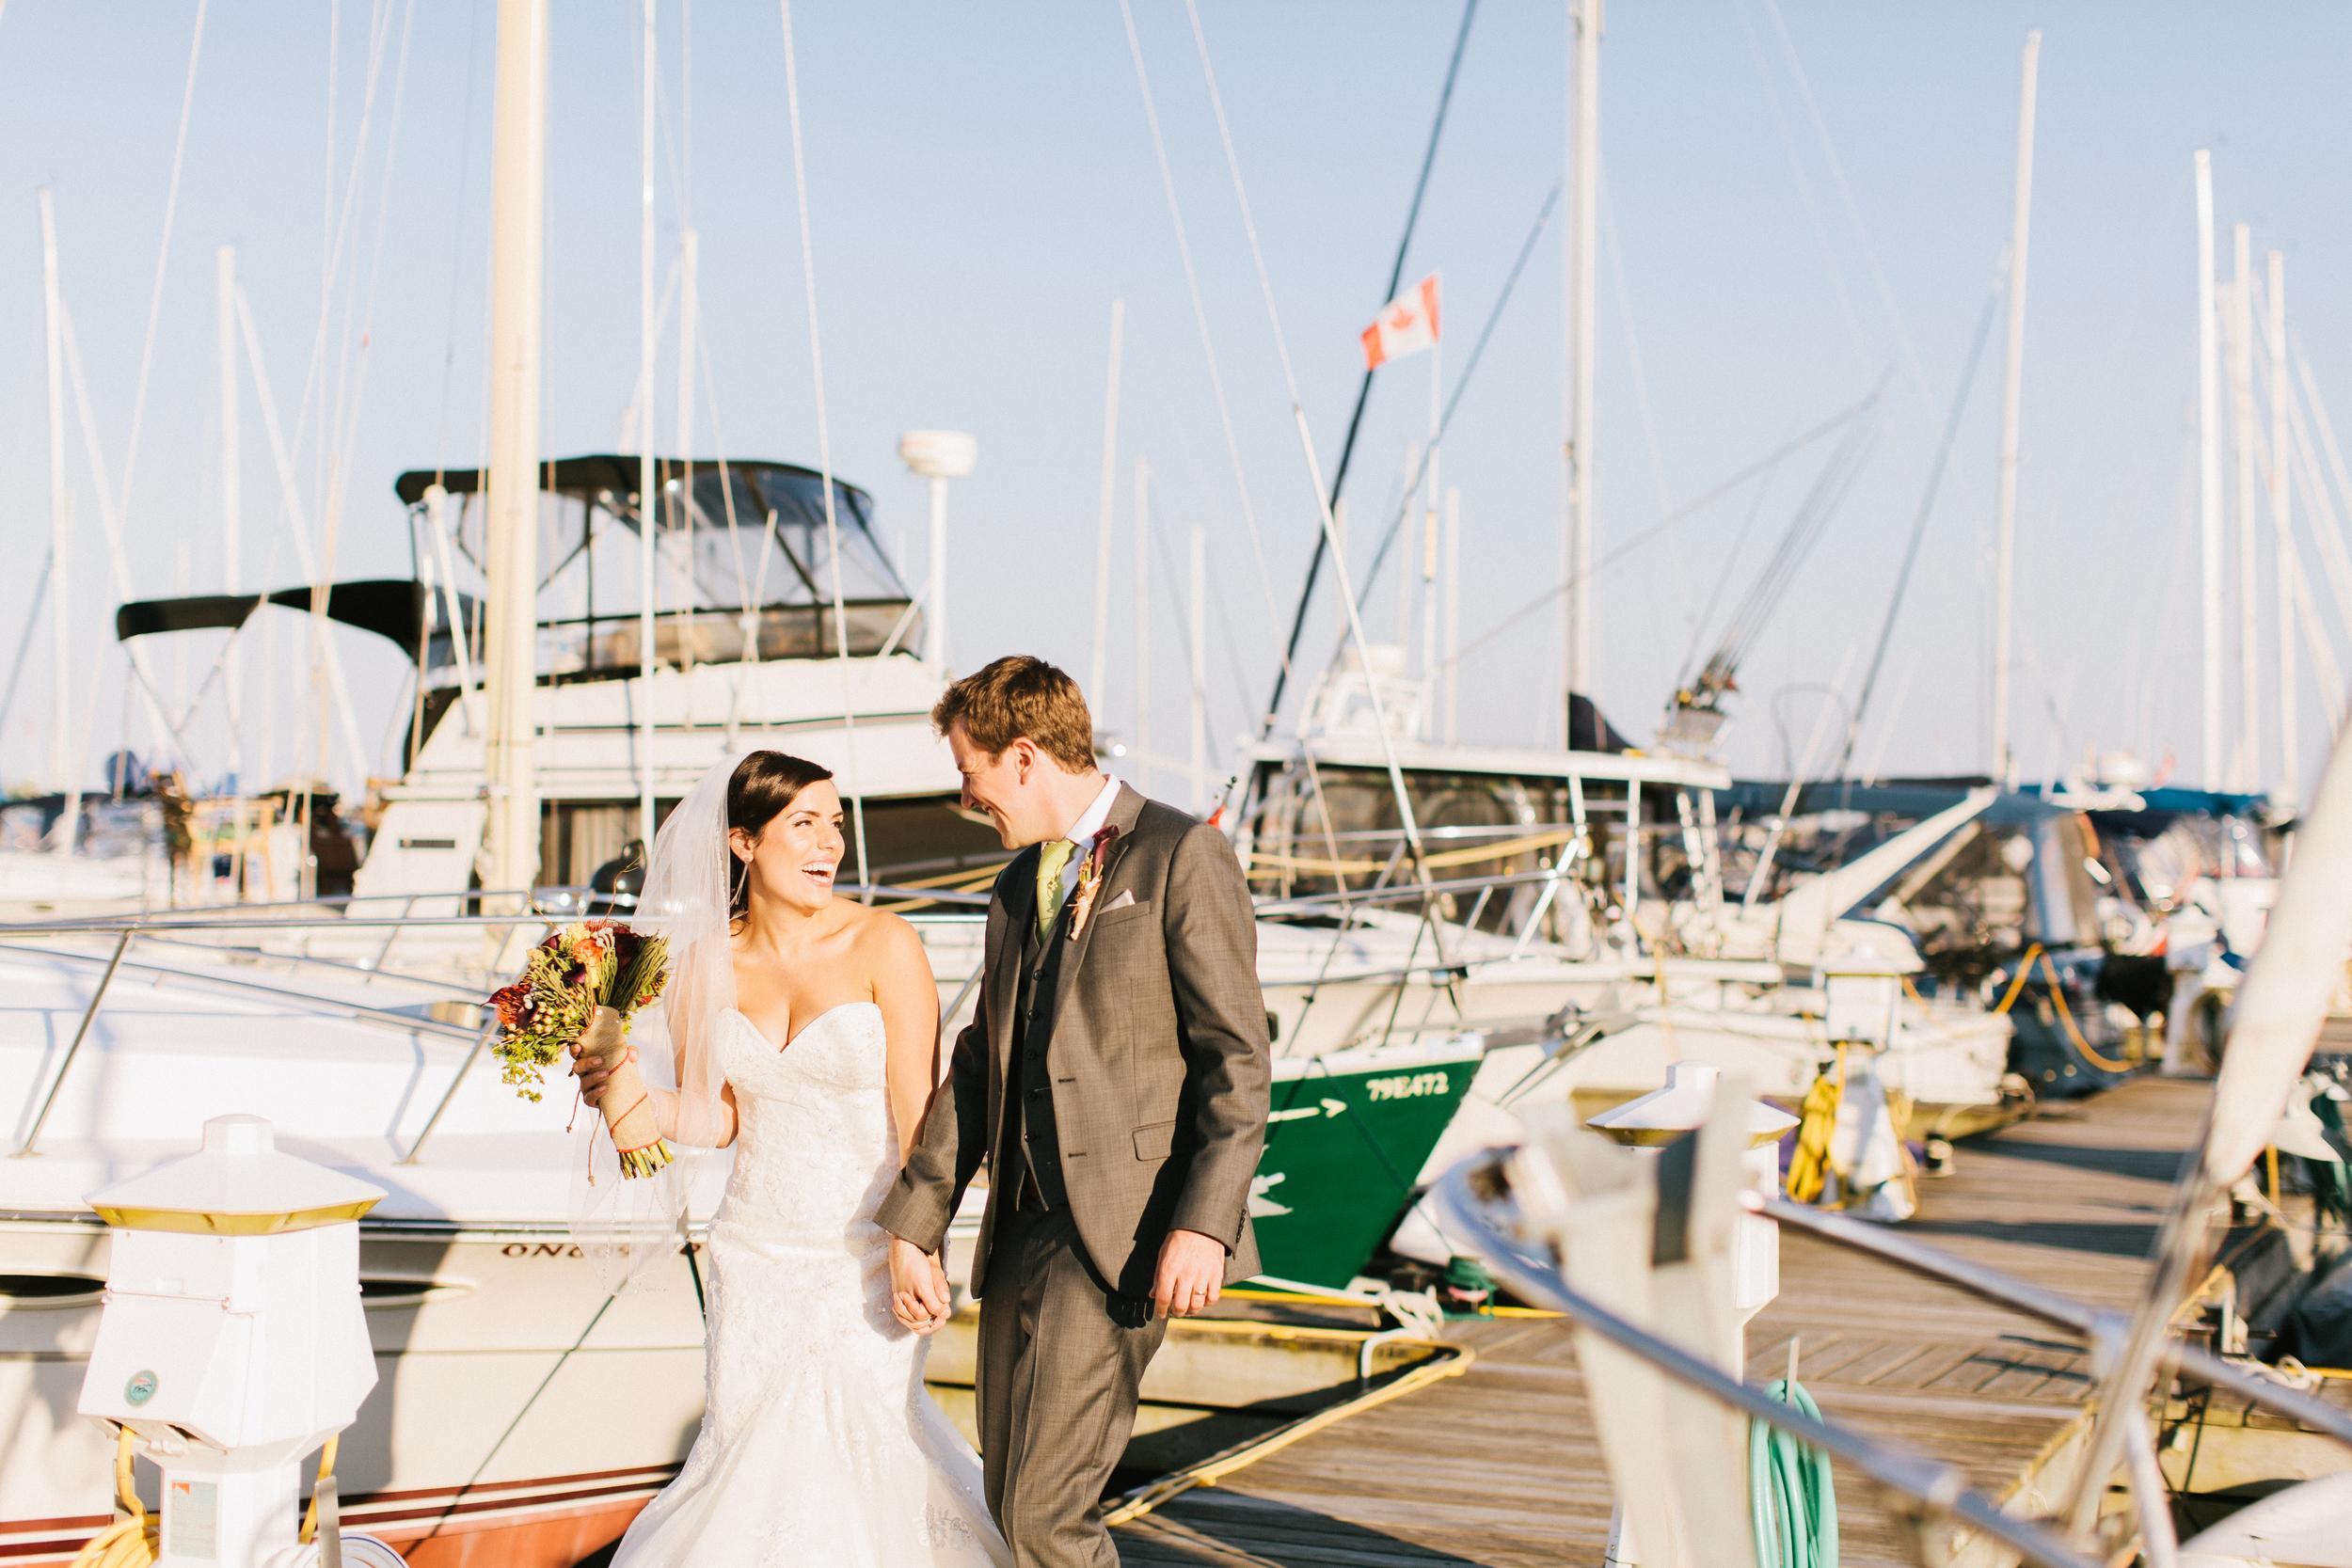 harbour-banquet-hall-oakville-wedding-photographer-michael-rousseau-photography-persian-wedding-photographer-isabella-daniel043.JPG